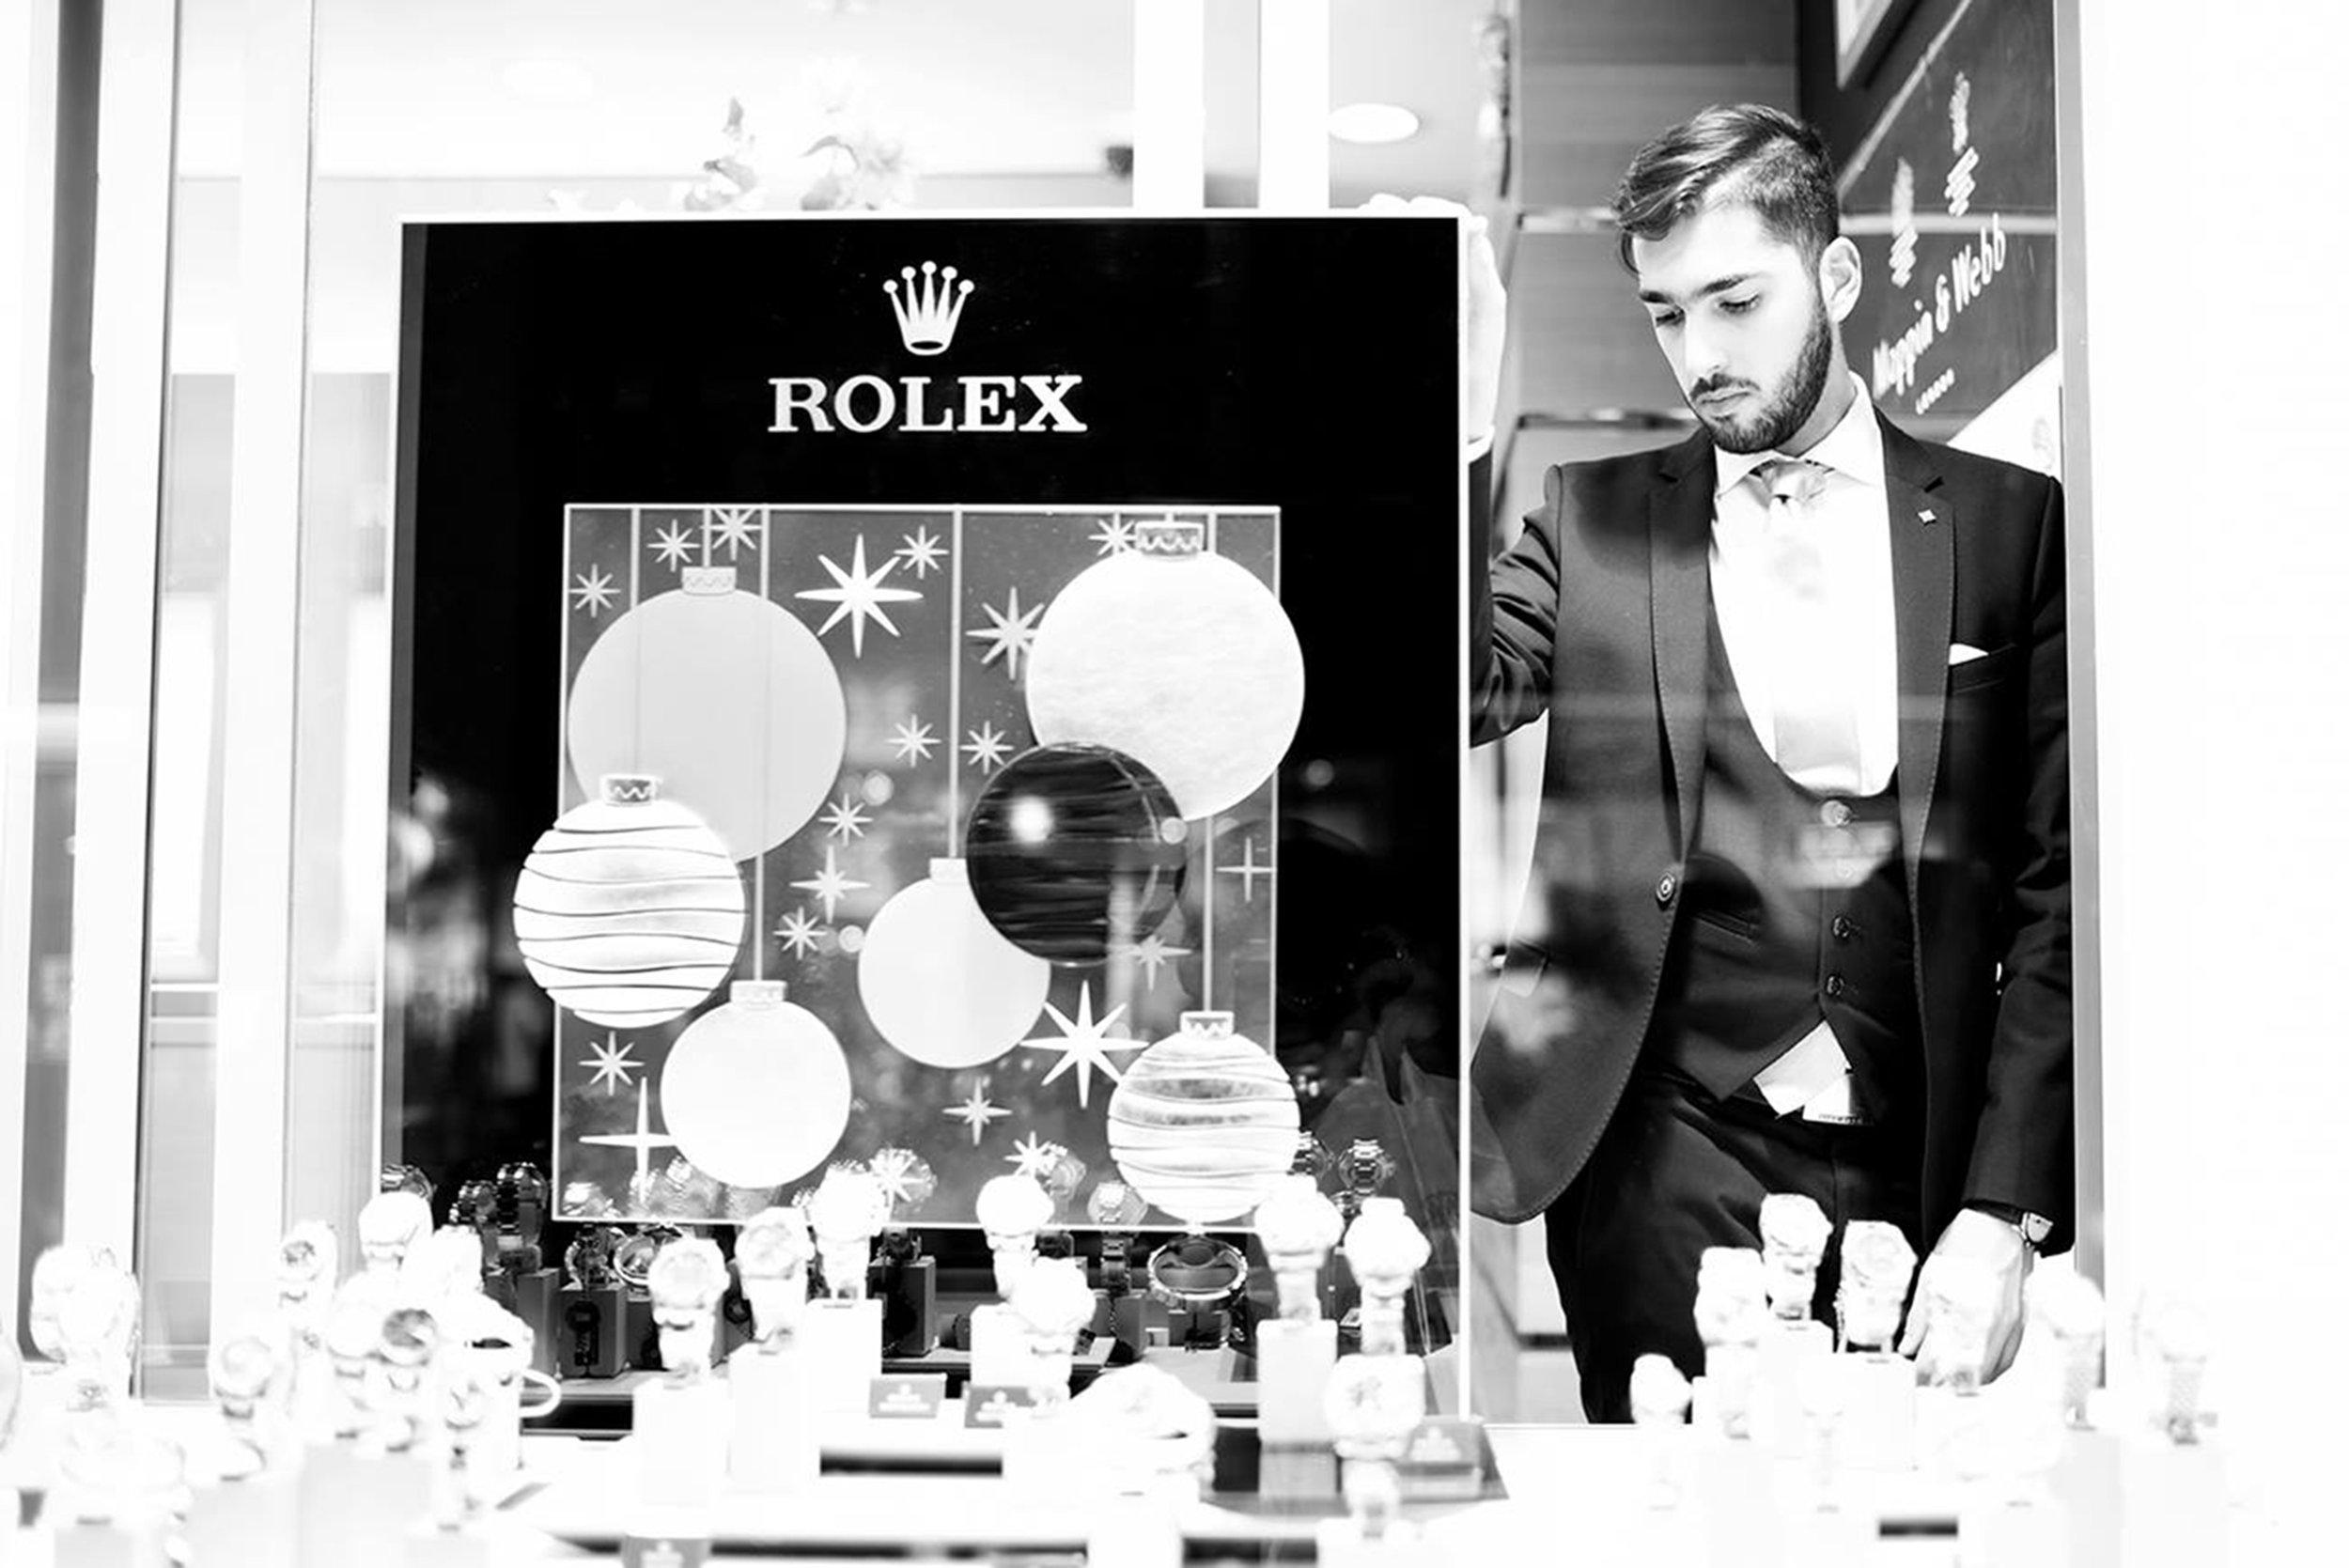 ROLEX WINDOW.jpg